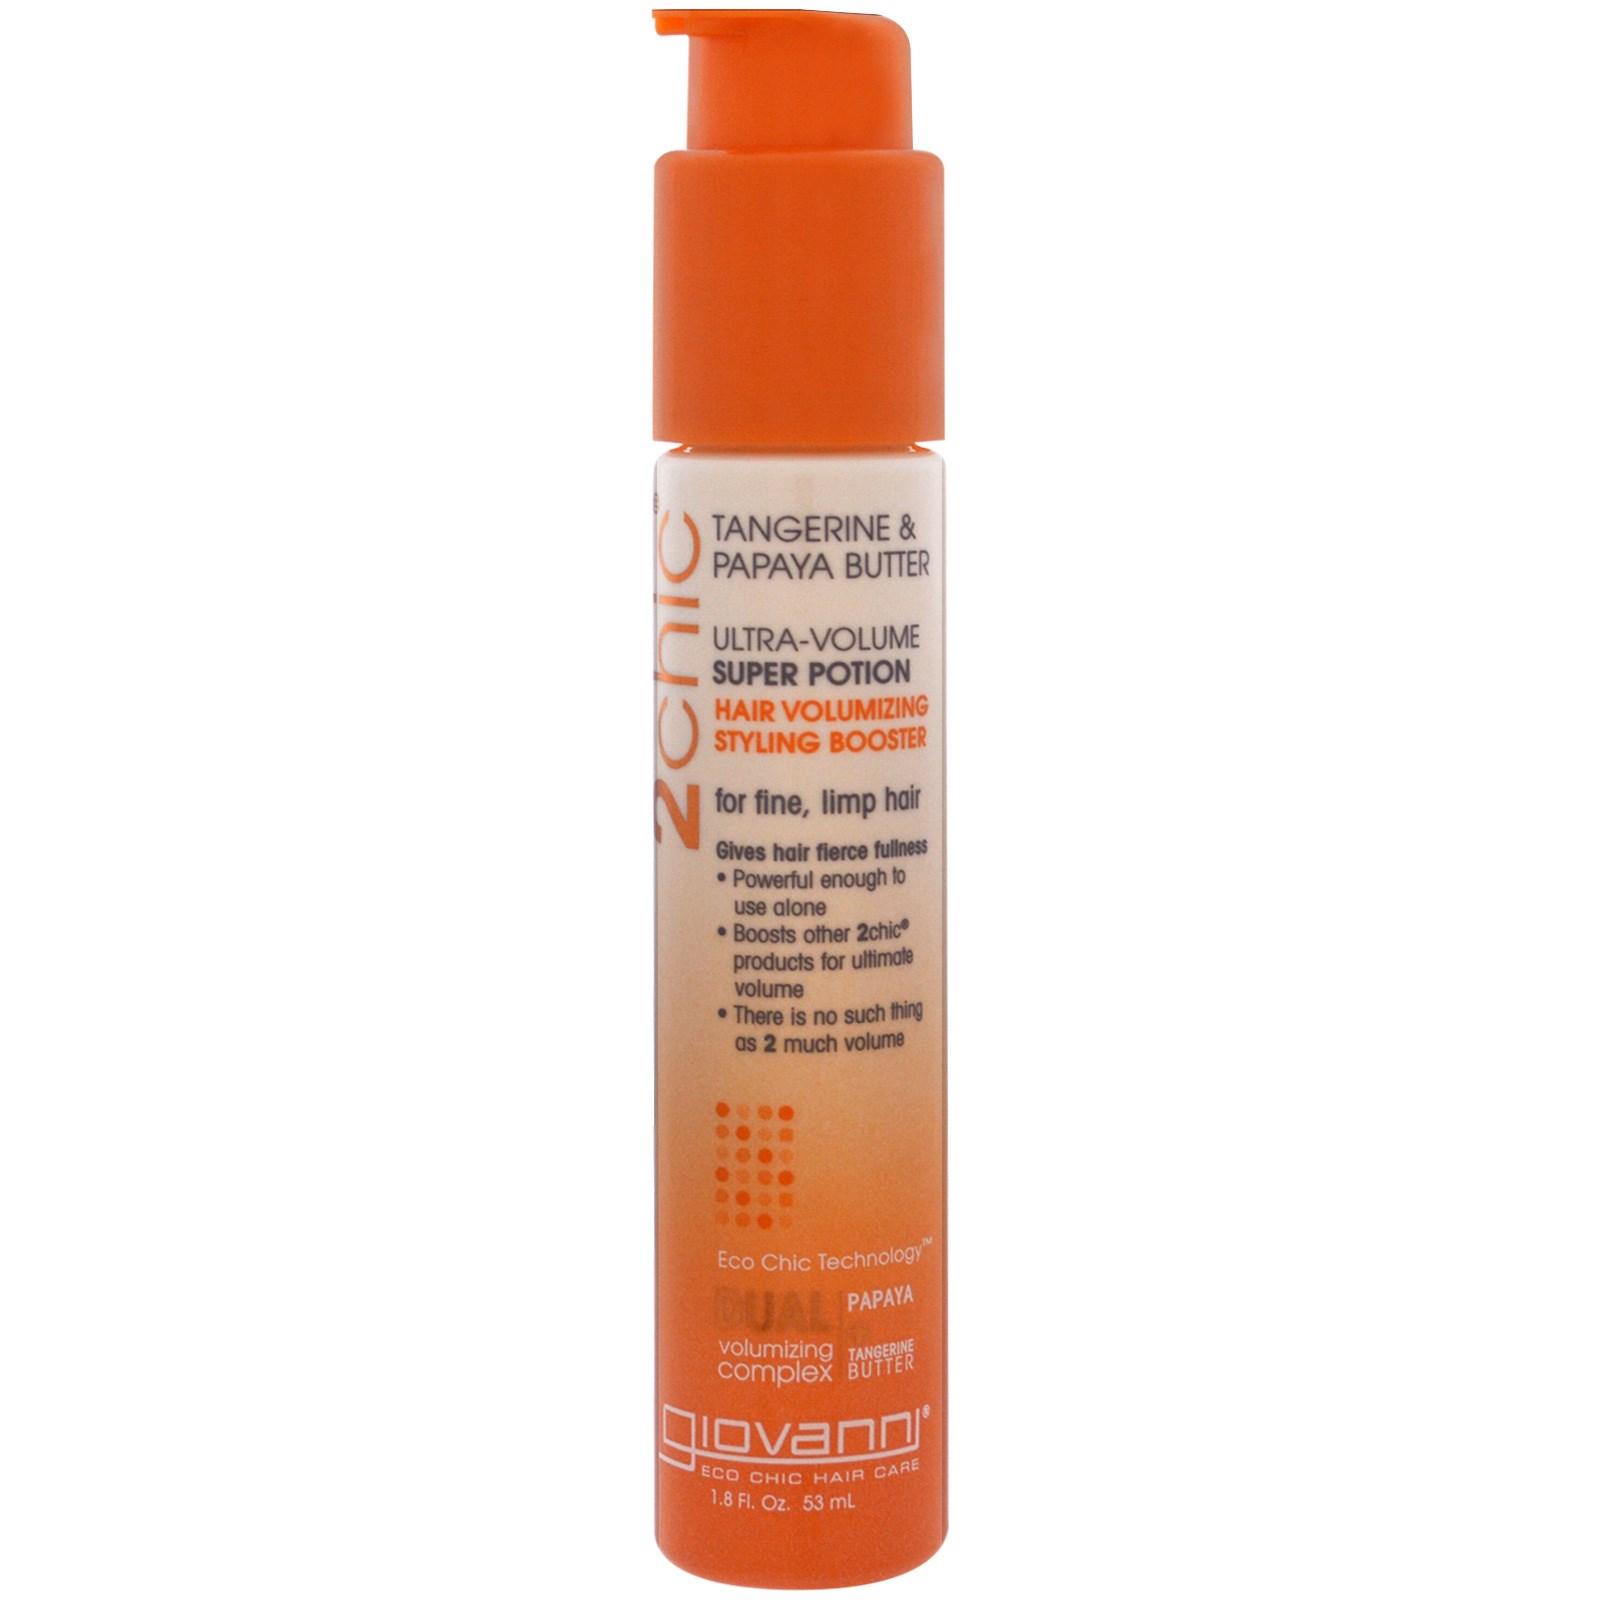 Giovanni, 2chic, средство для увеличения объема волос, средство для объемной укладки, масла мандарина и папайи, 1.8 унций (53 мл)